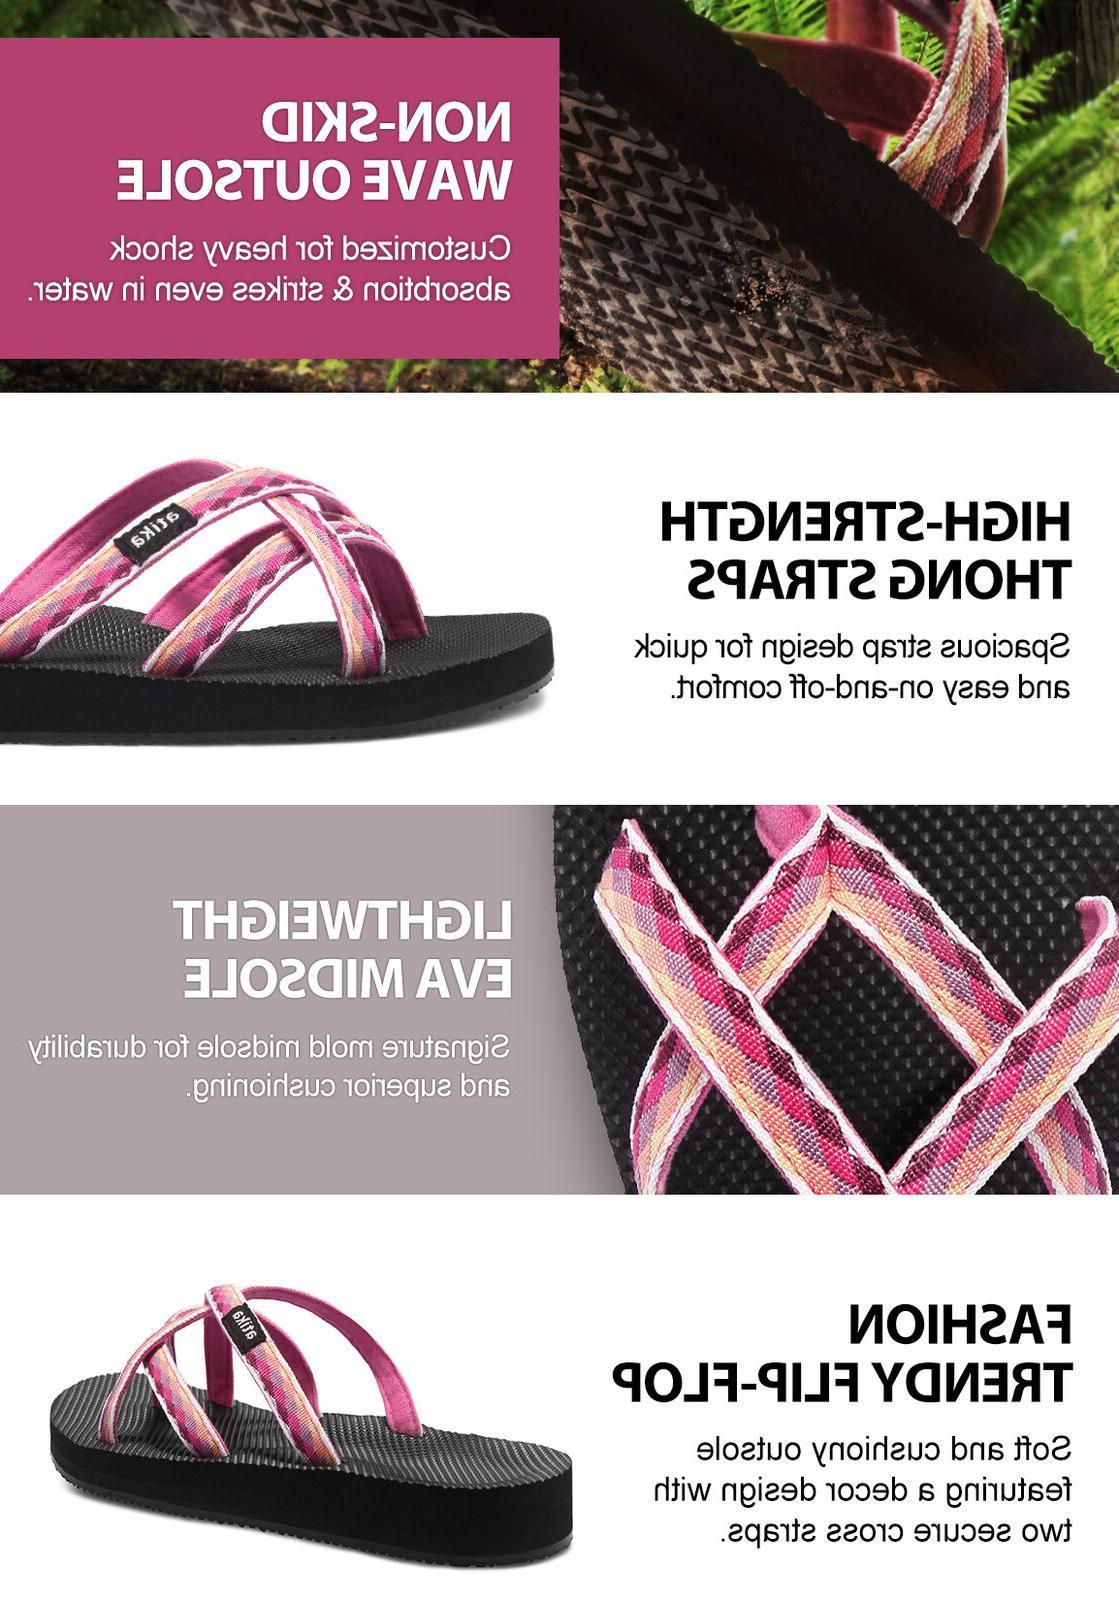 ATIKA Sandals, Beach Flops, Support Platform